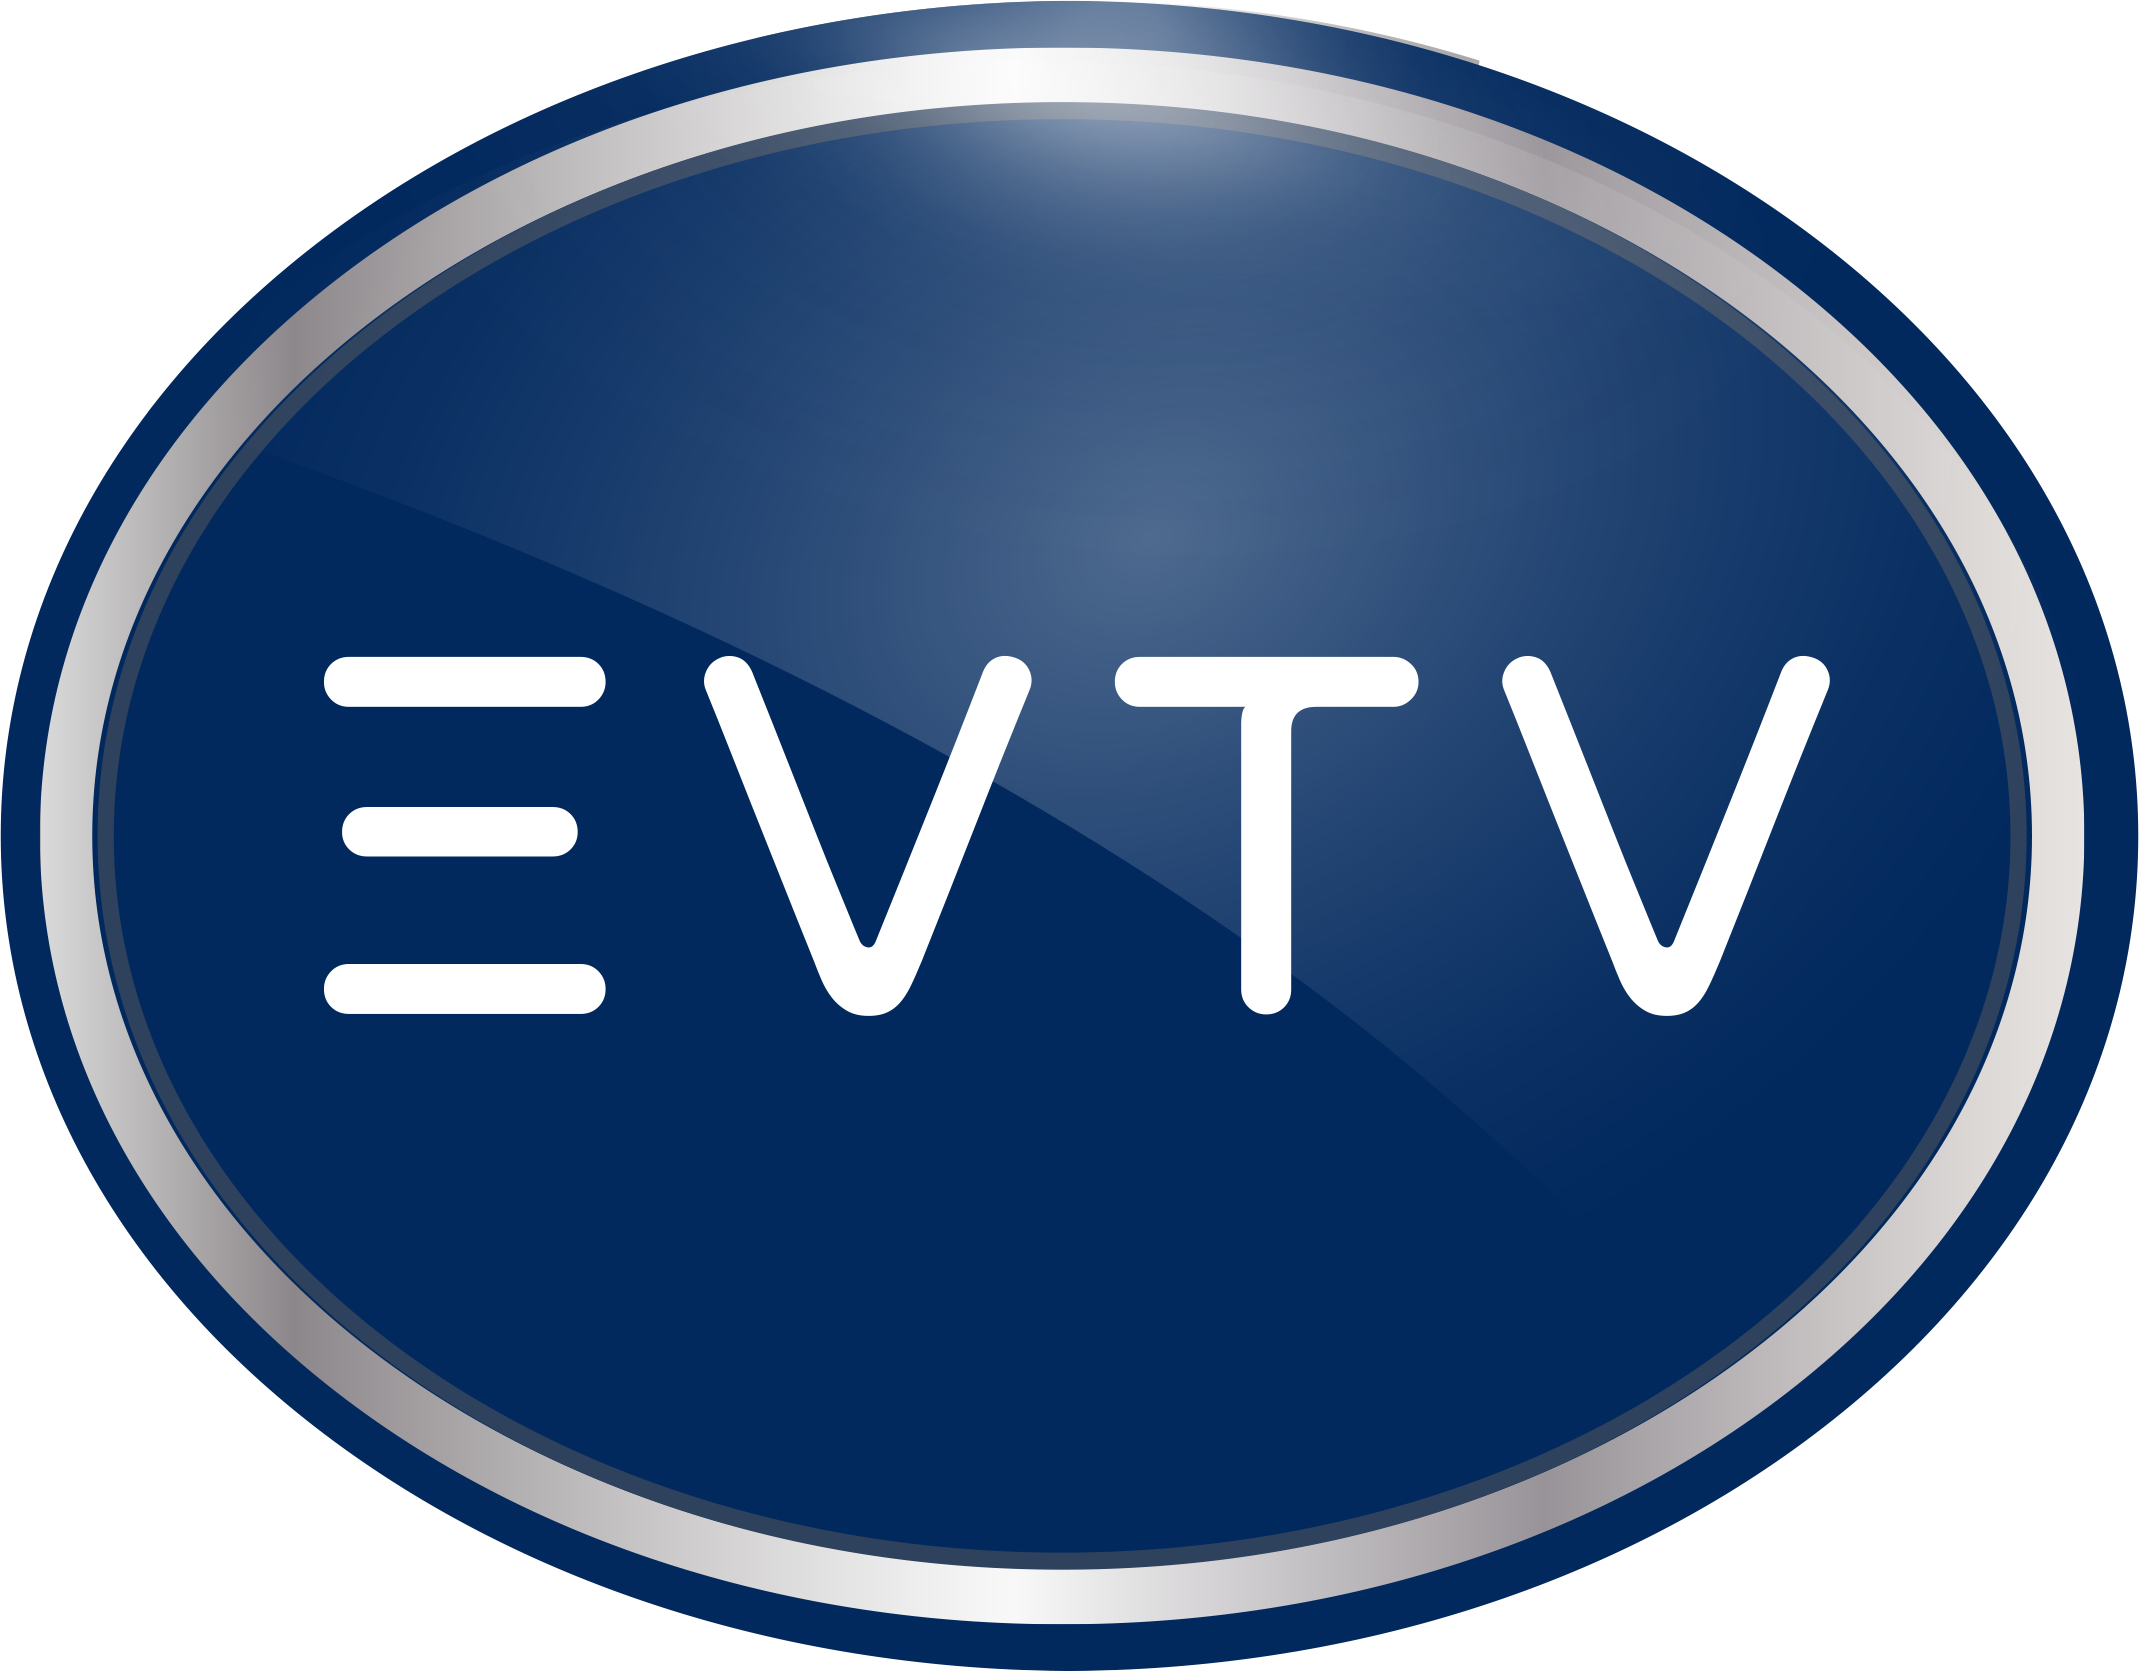 Envirotech Vehicles, Inc